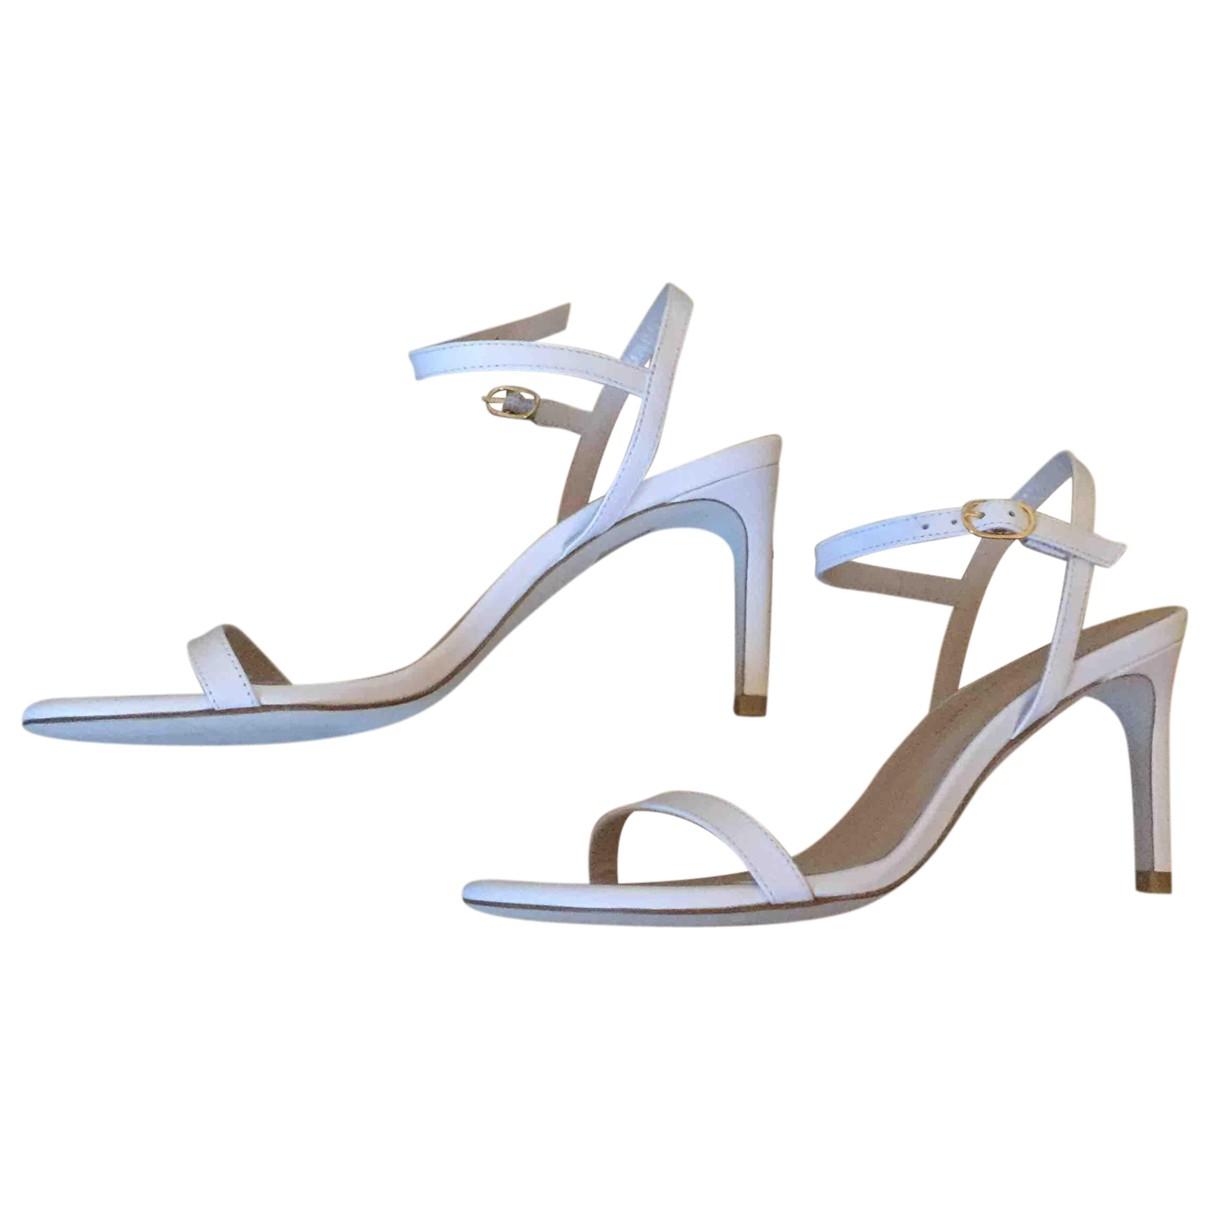 Stuart Weitzman \N White Leather Sandals for Women 36.5 EU